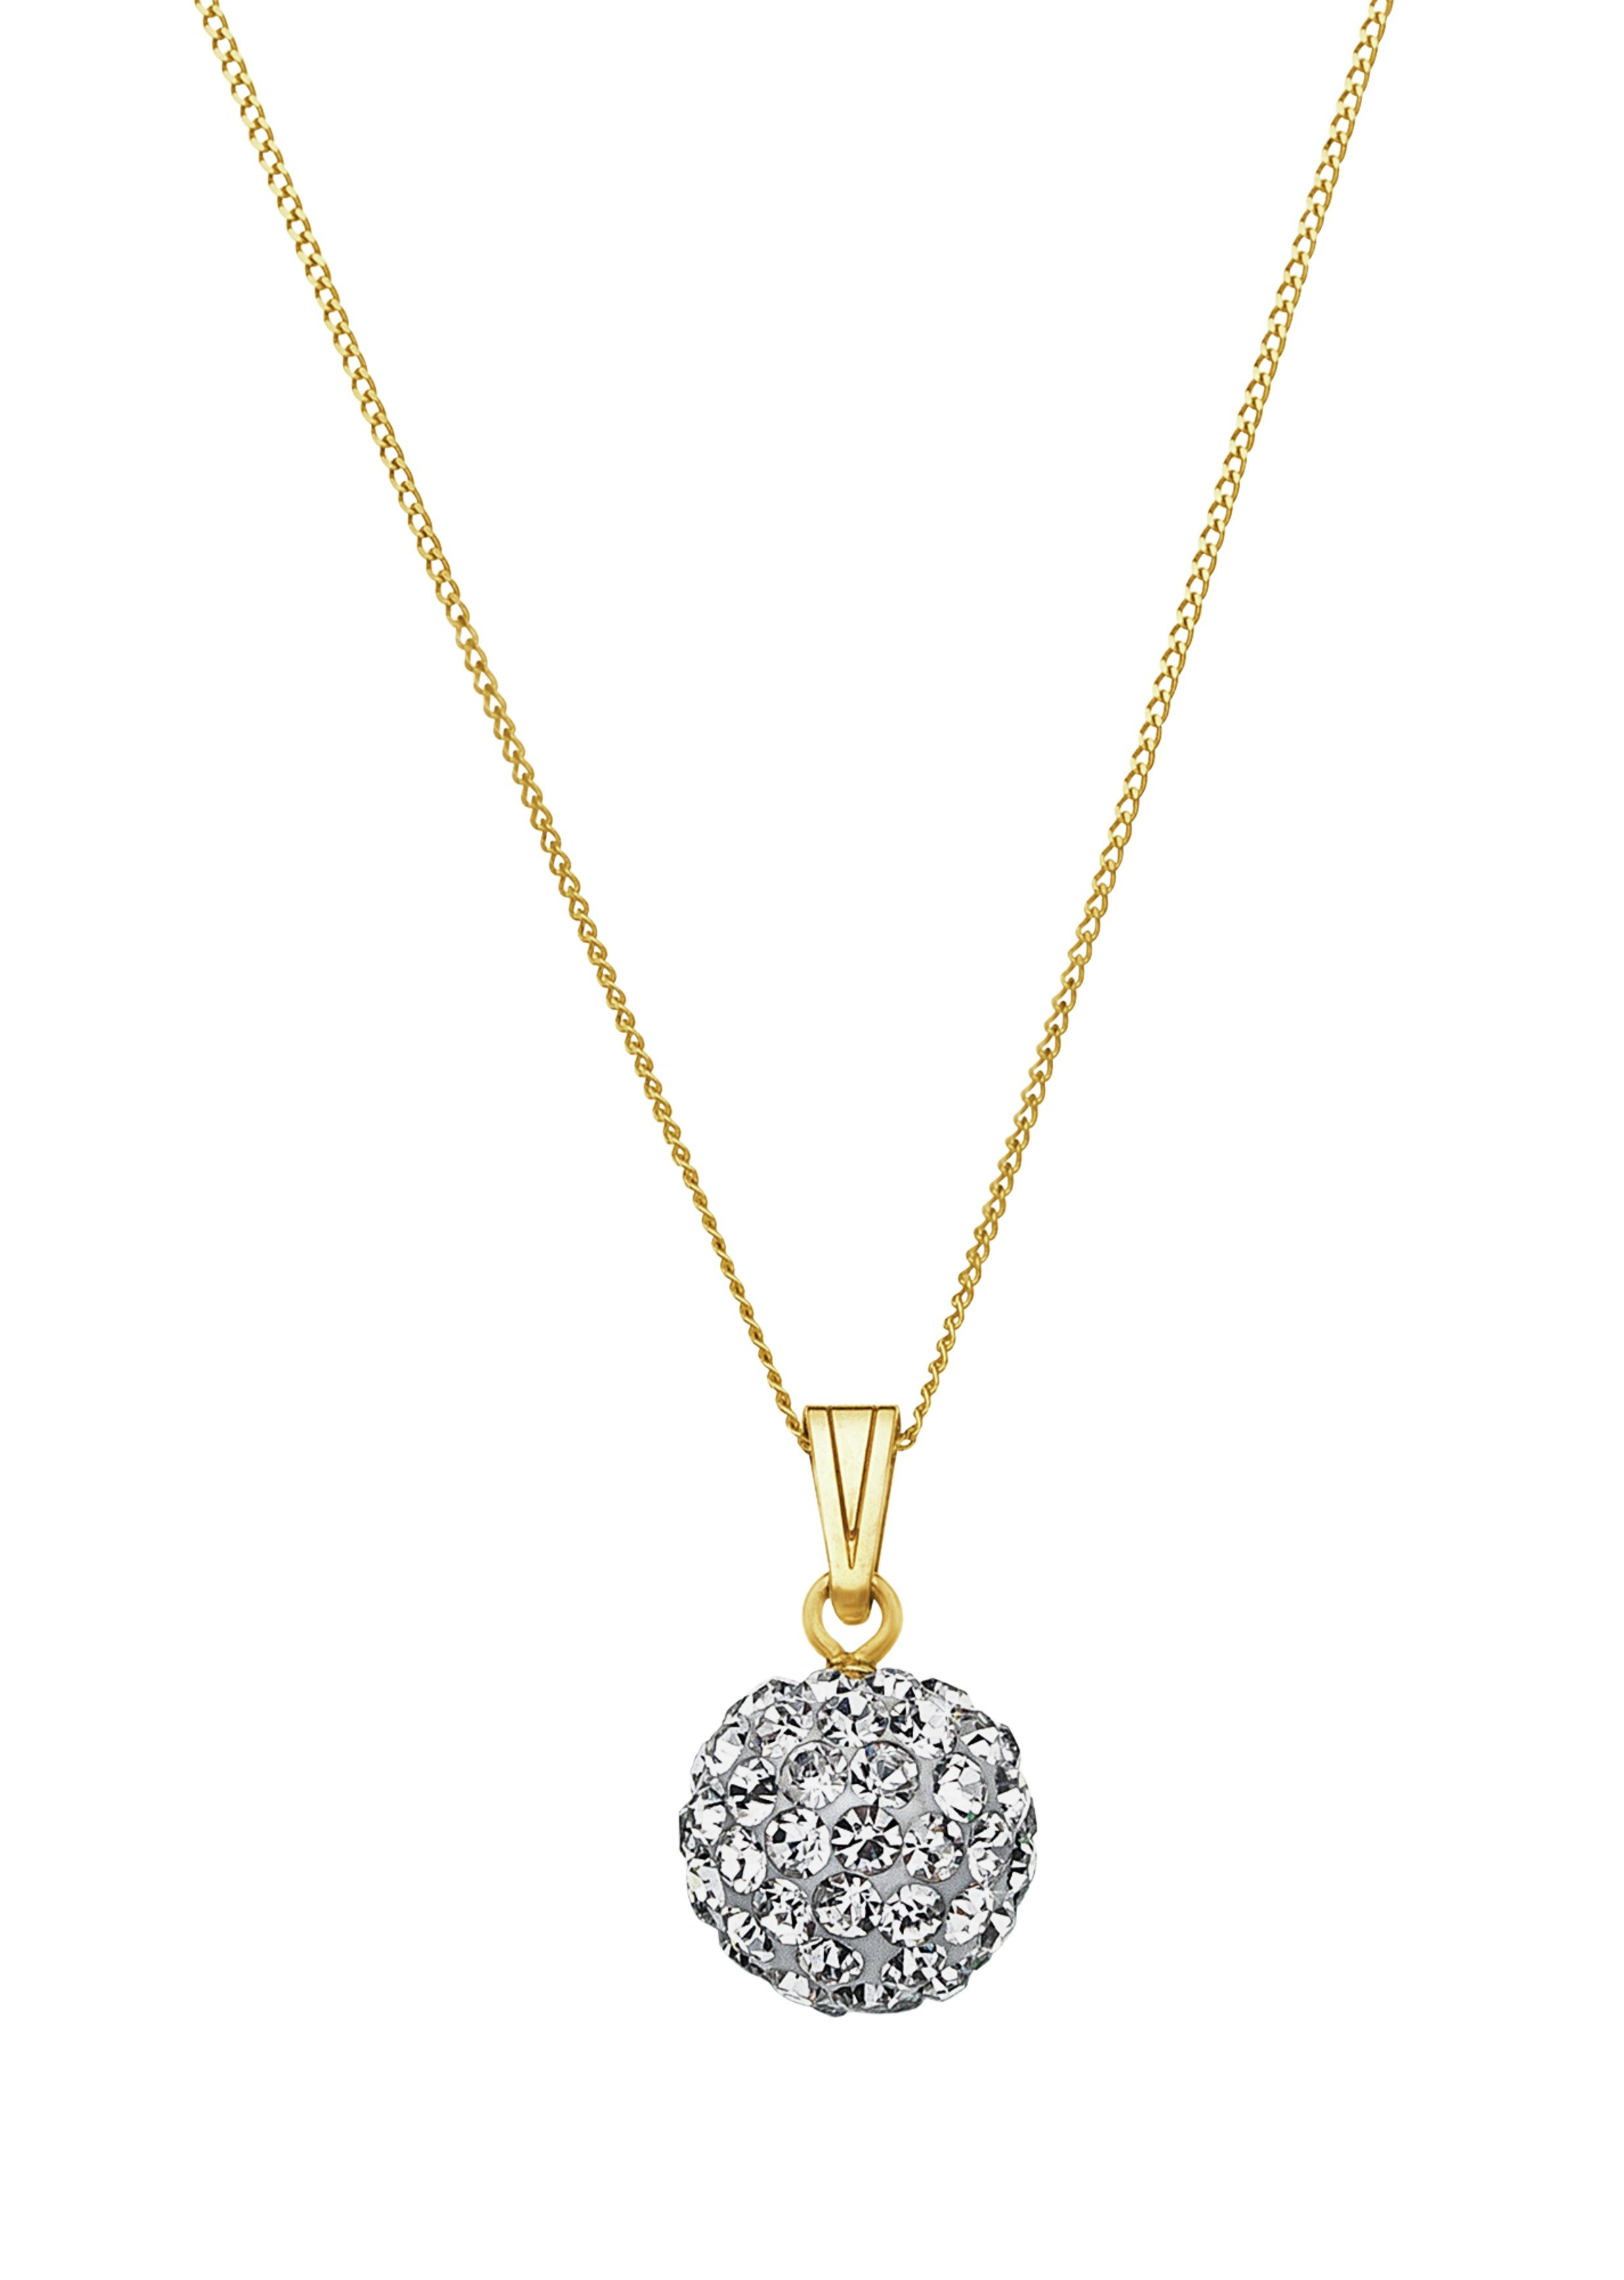 Revere 9ct Yellow Gold Crystal Glitter Ball Pendant